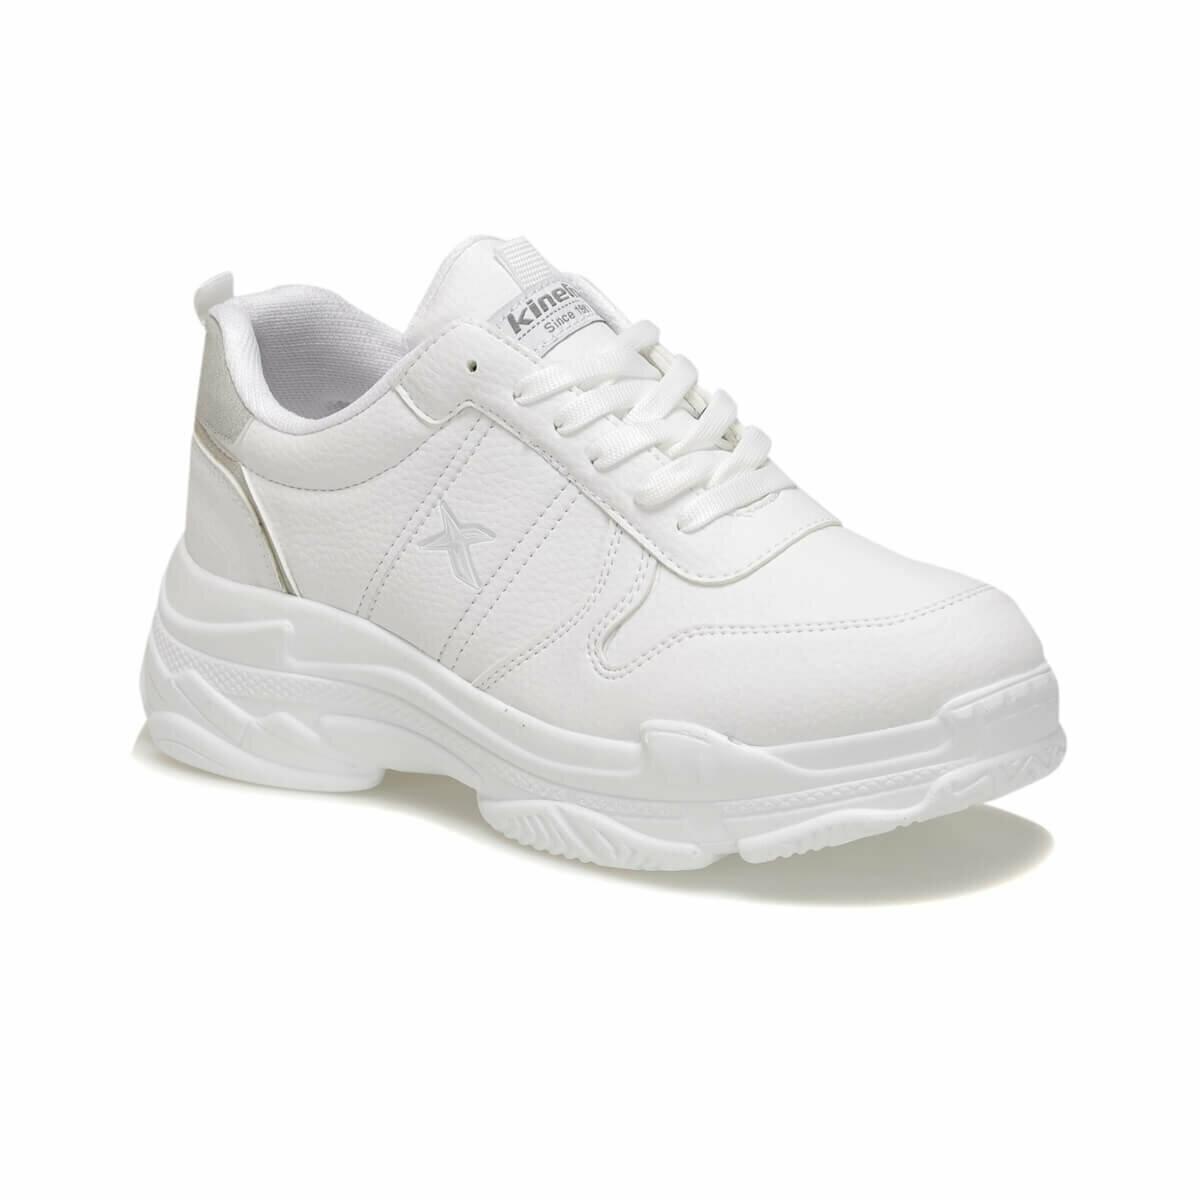 FLO CRIME 9PR White Male Shoes KINETIX